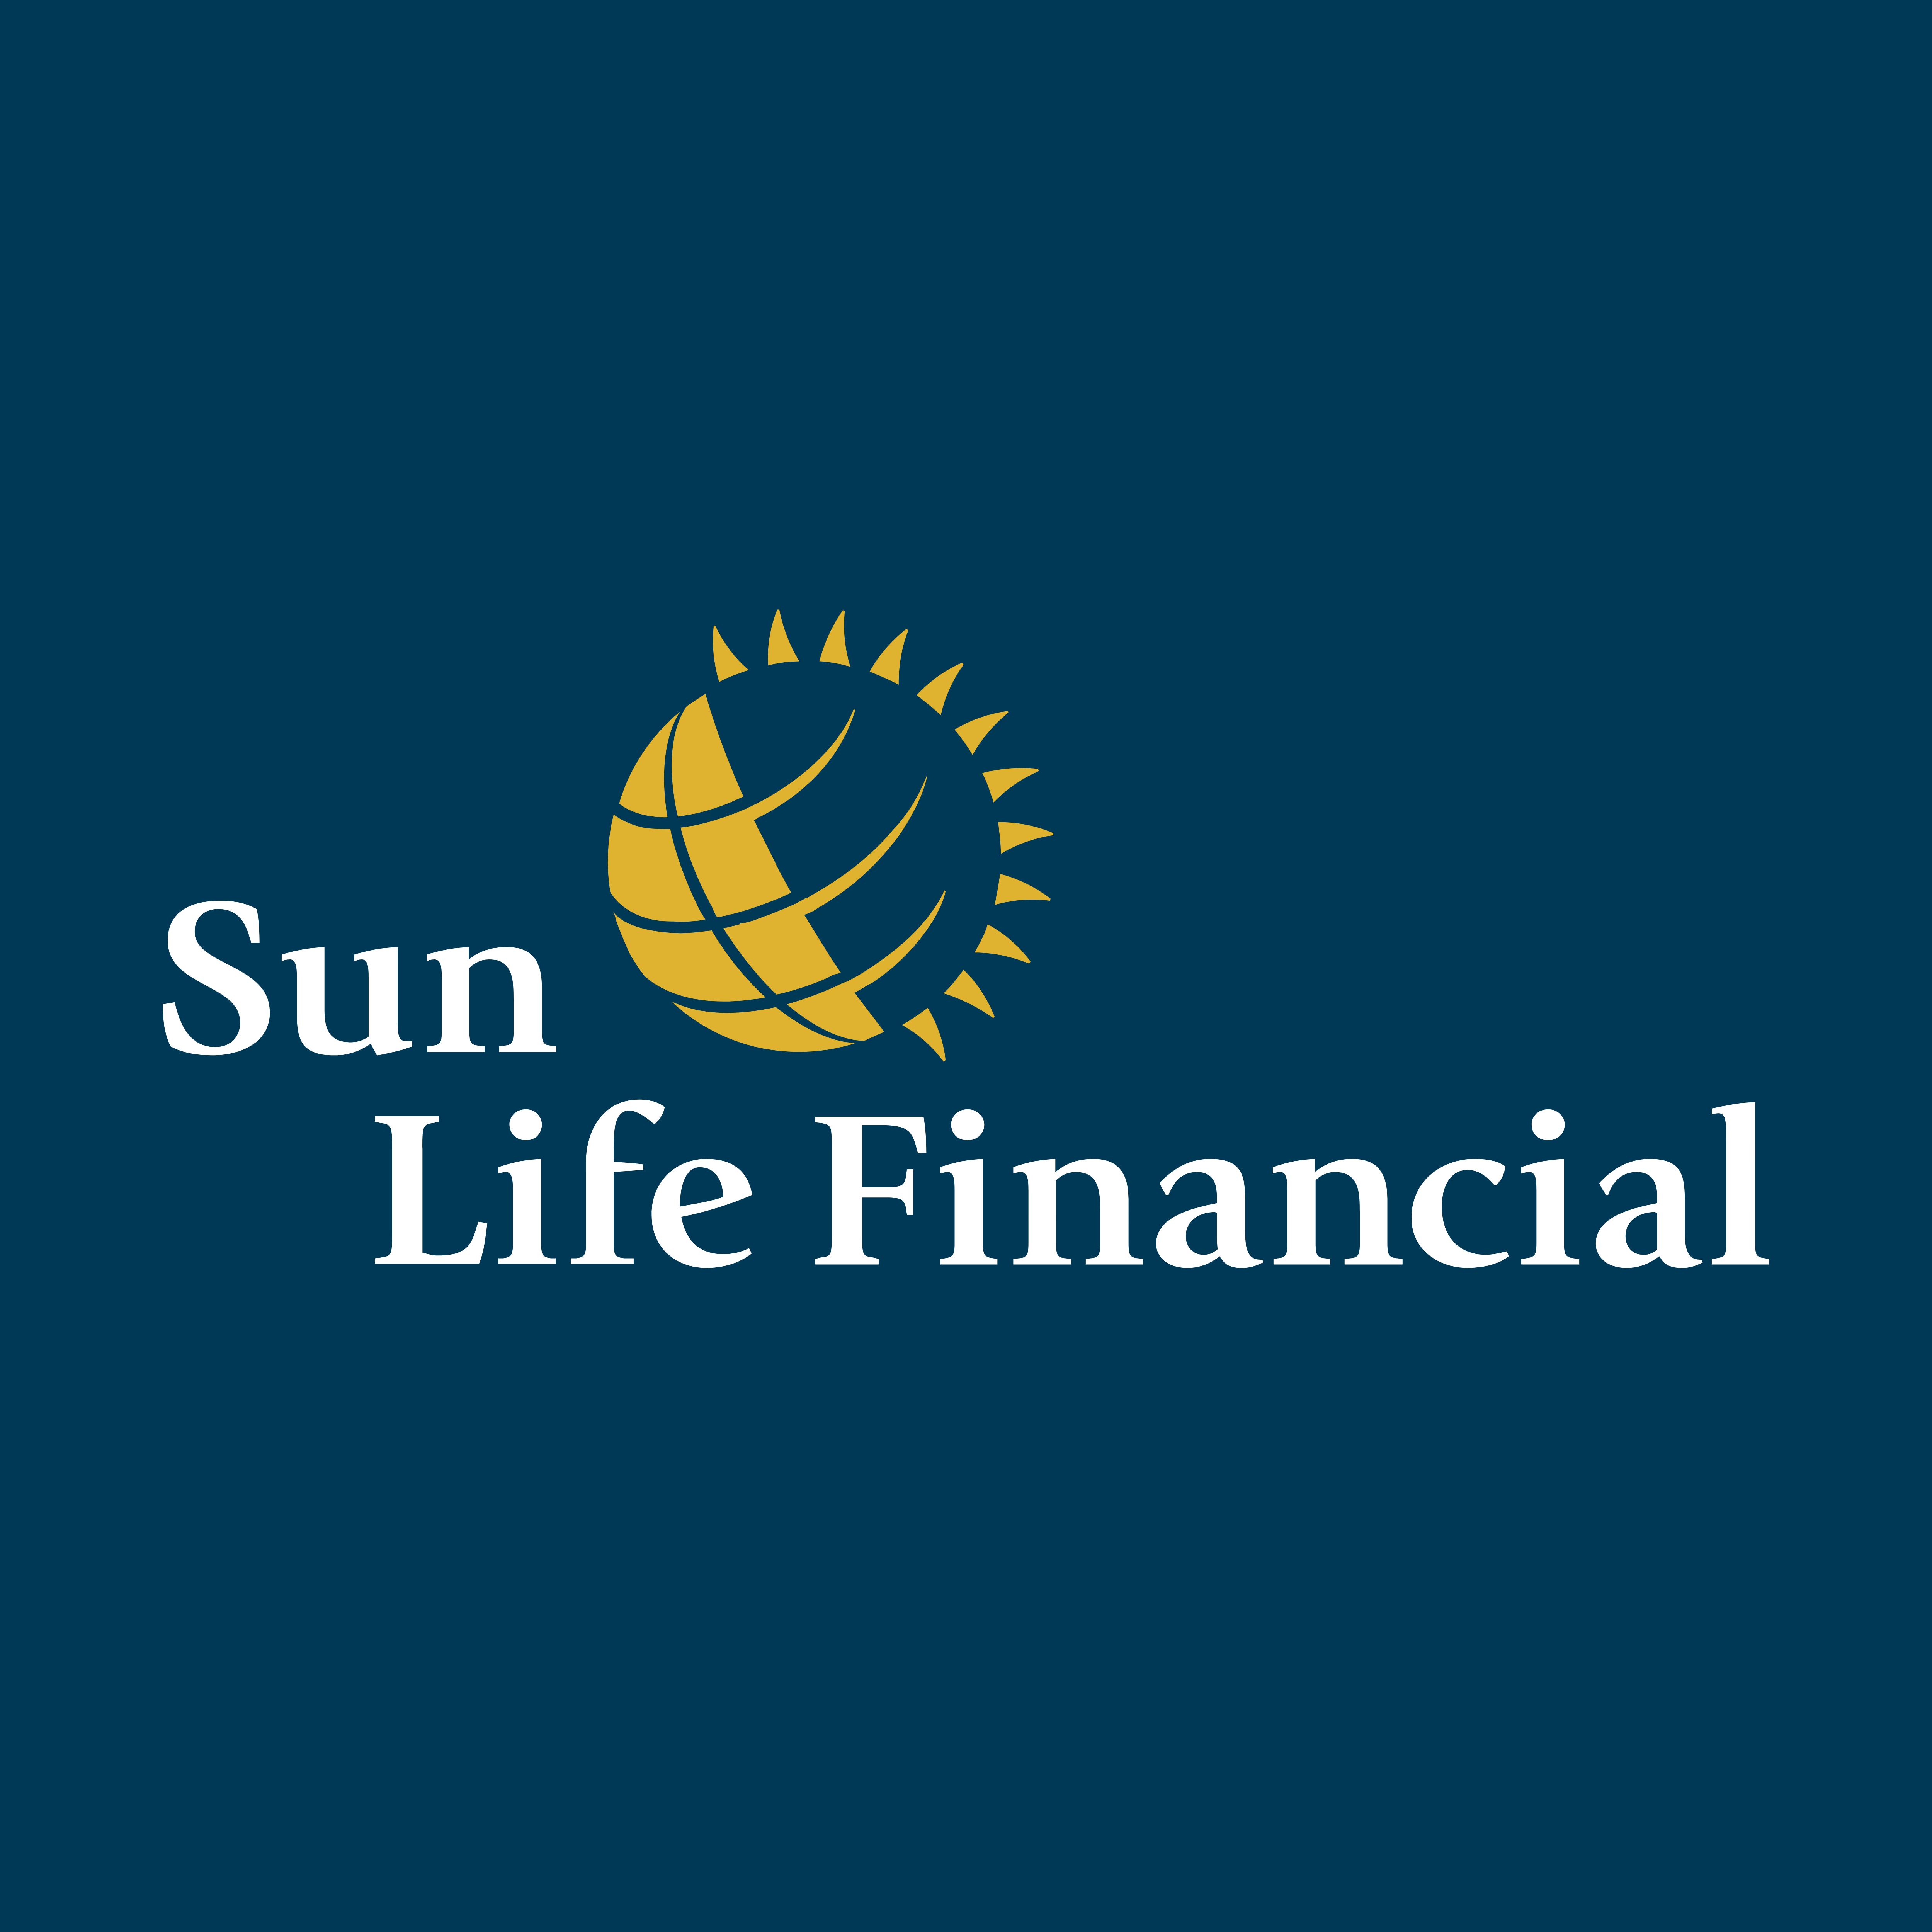 Sun Life Financial.